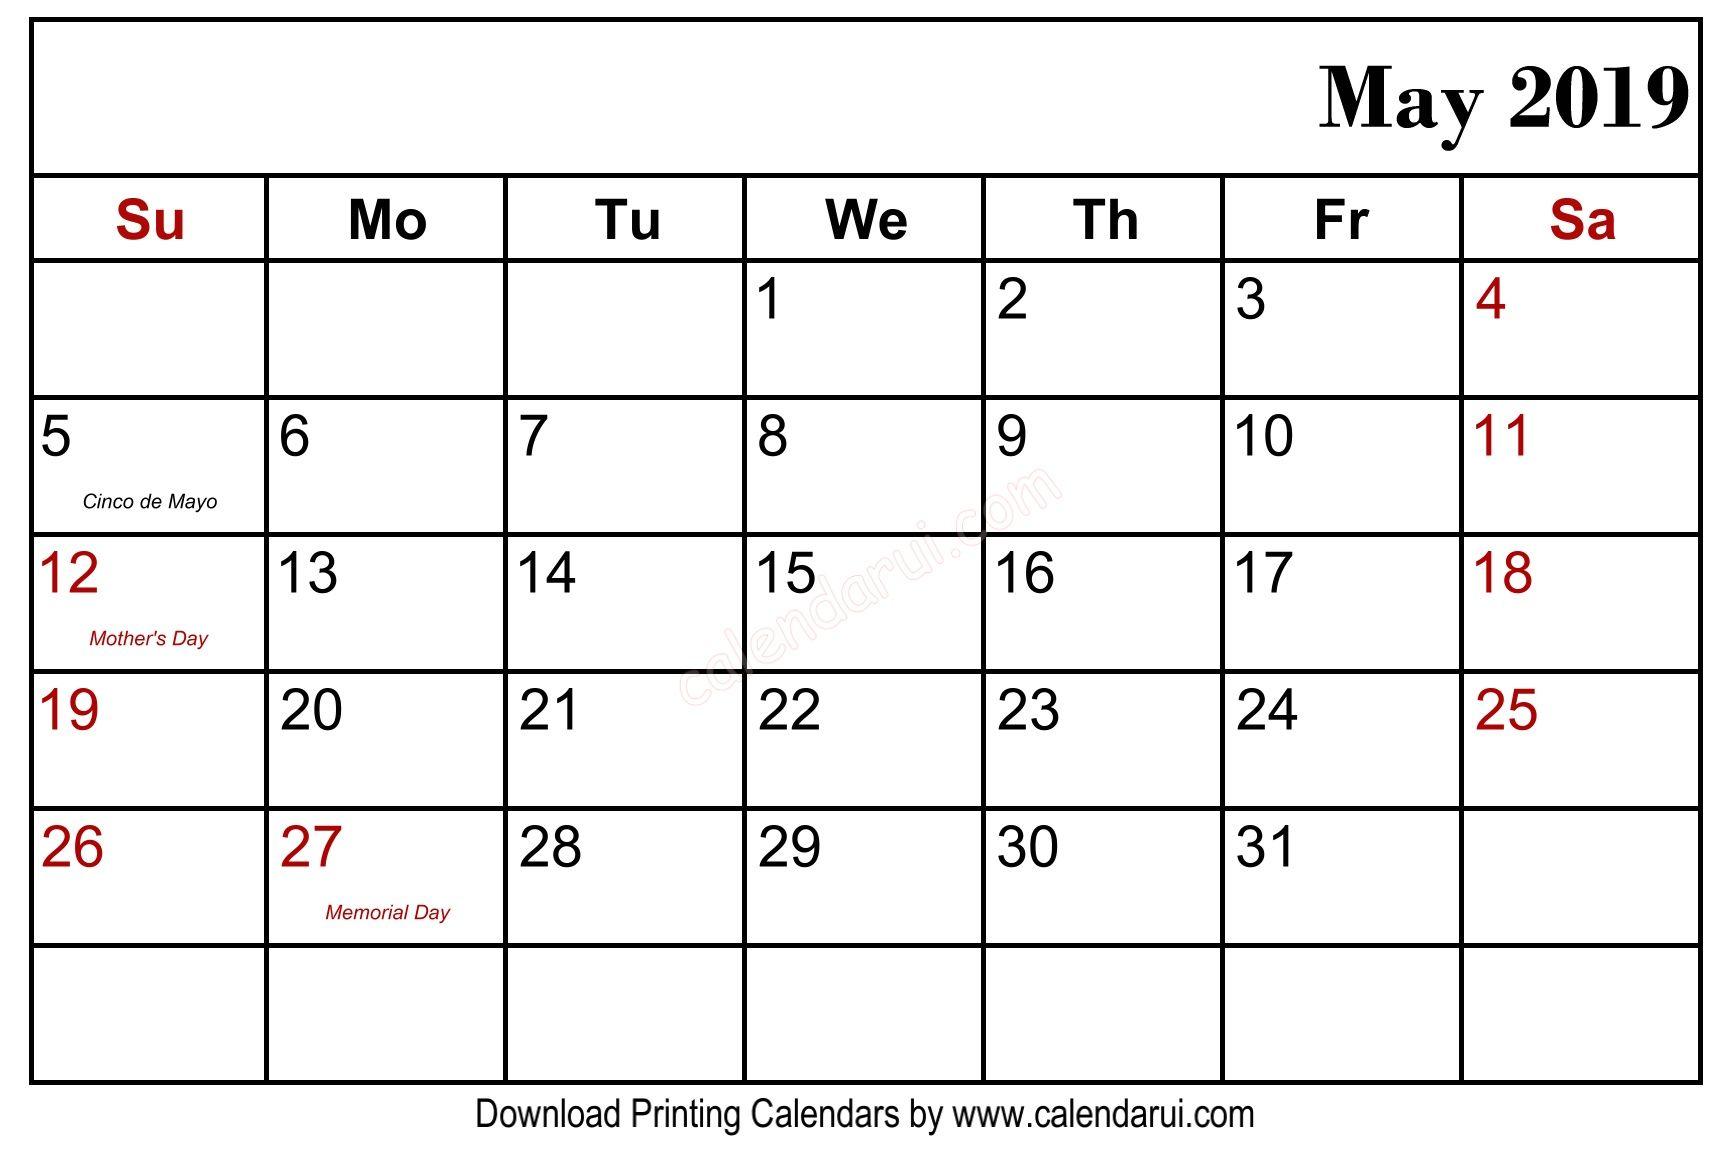 The Best May 2019 Calendar Holidays Printable | Calendar